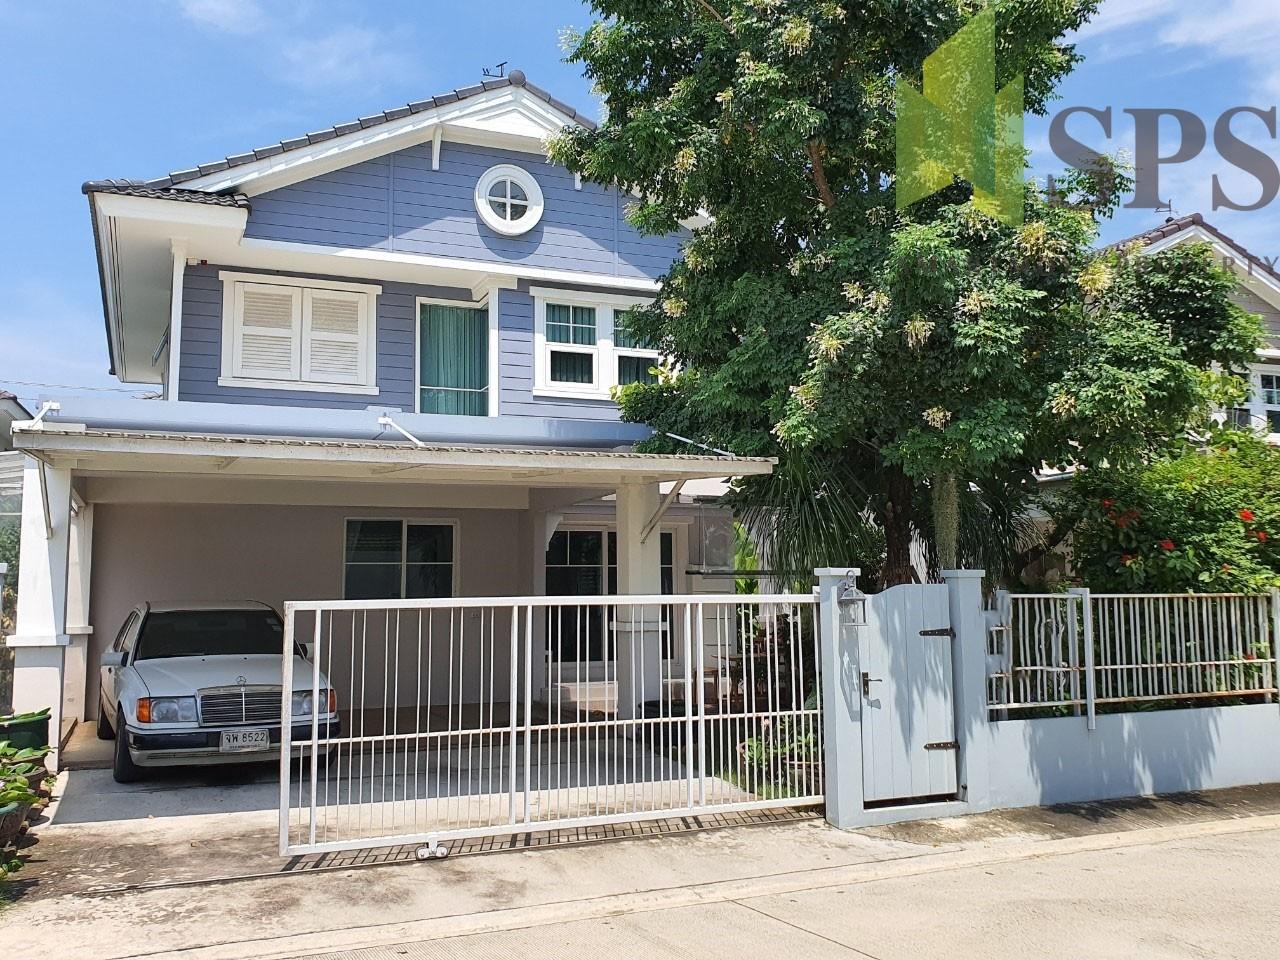 For Rent Single House Near Mege Bangna Chaiyapruek Village Bangna km. 7 ( SPSPE285)